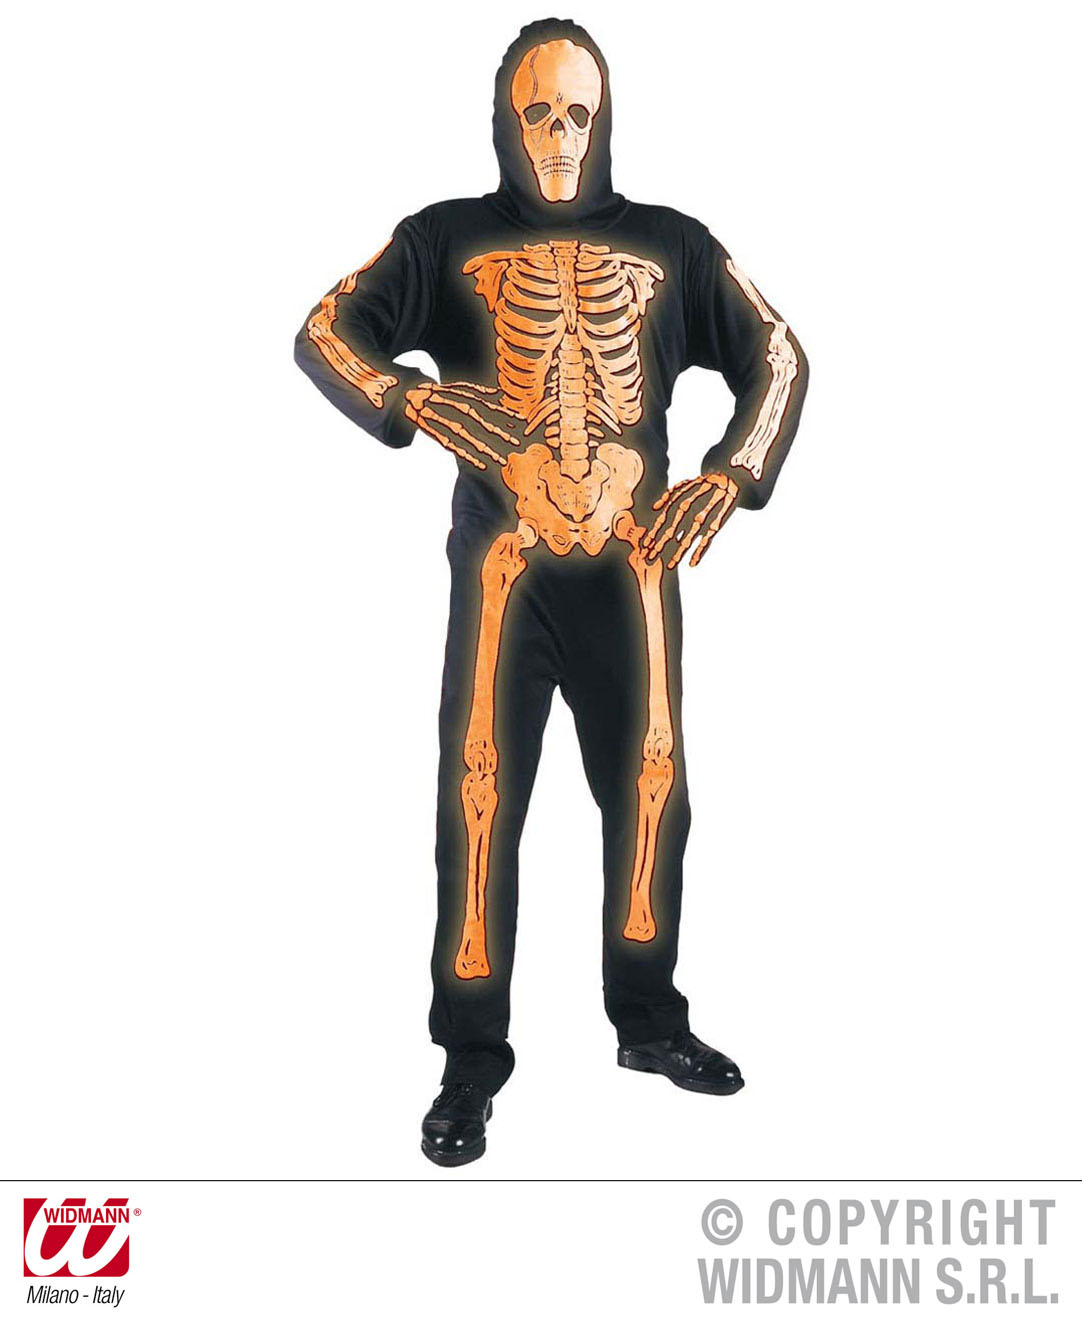 Childrens 3D Neon Orange Skeleton Fancy Dress Costume Halloween Outfit 158Cm